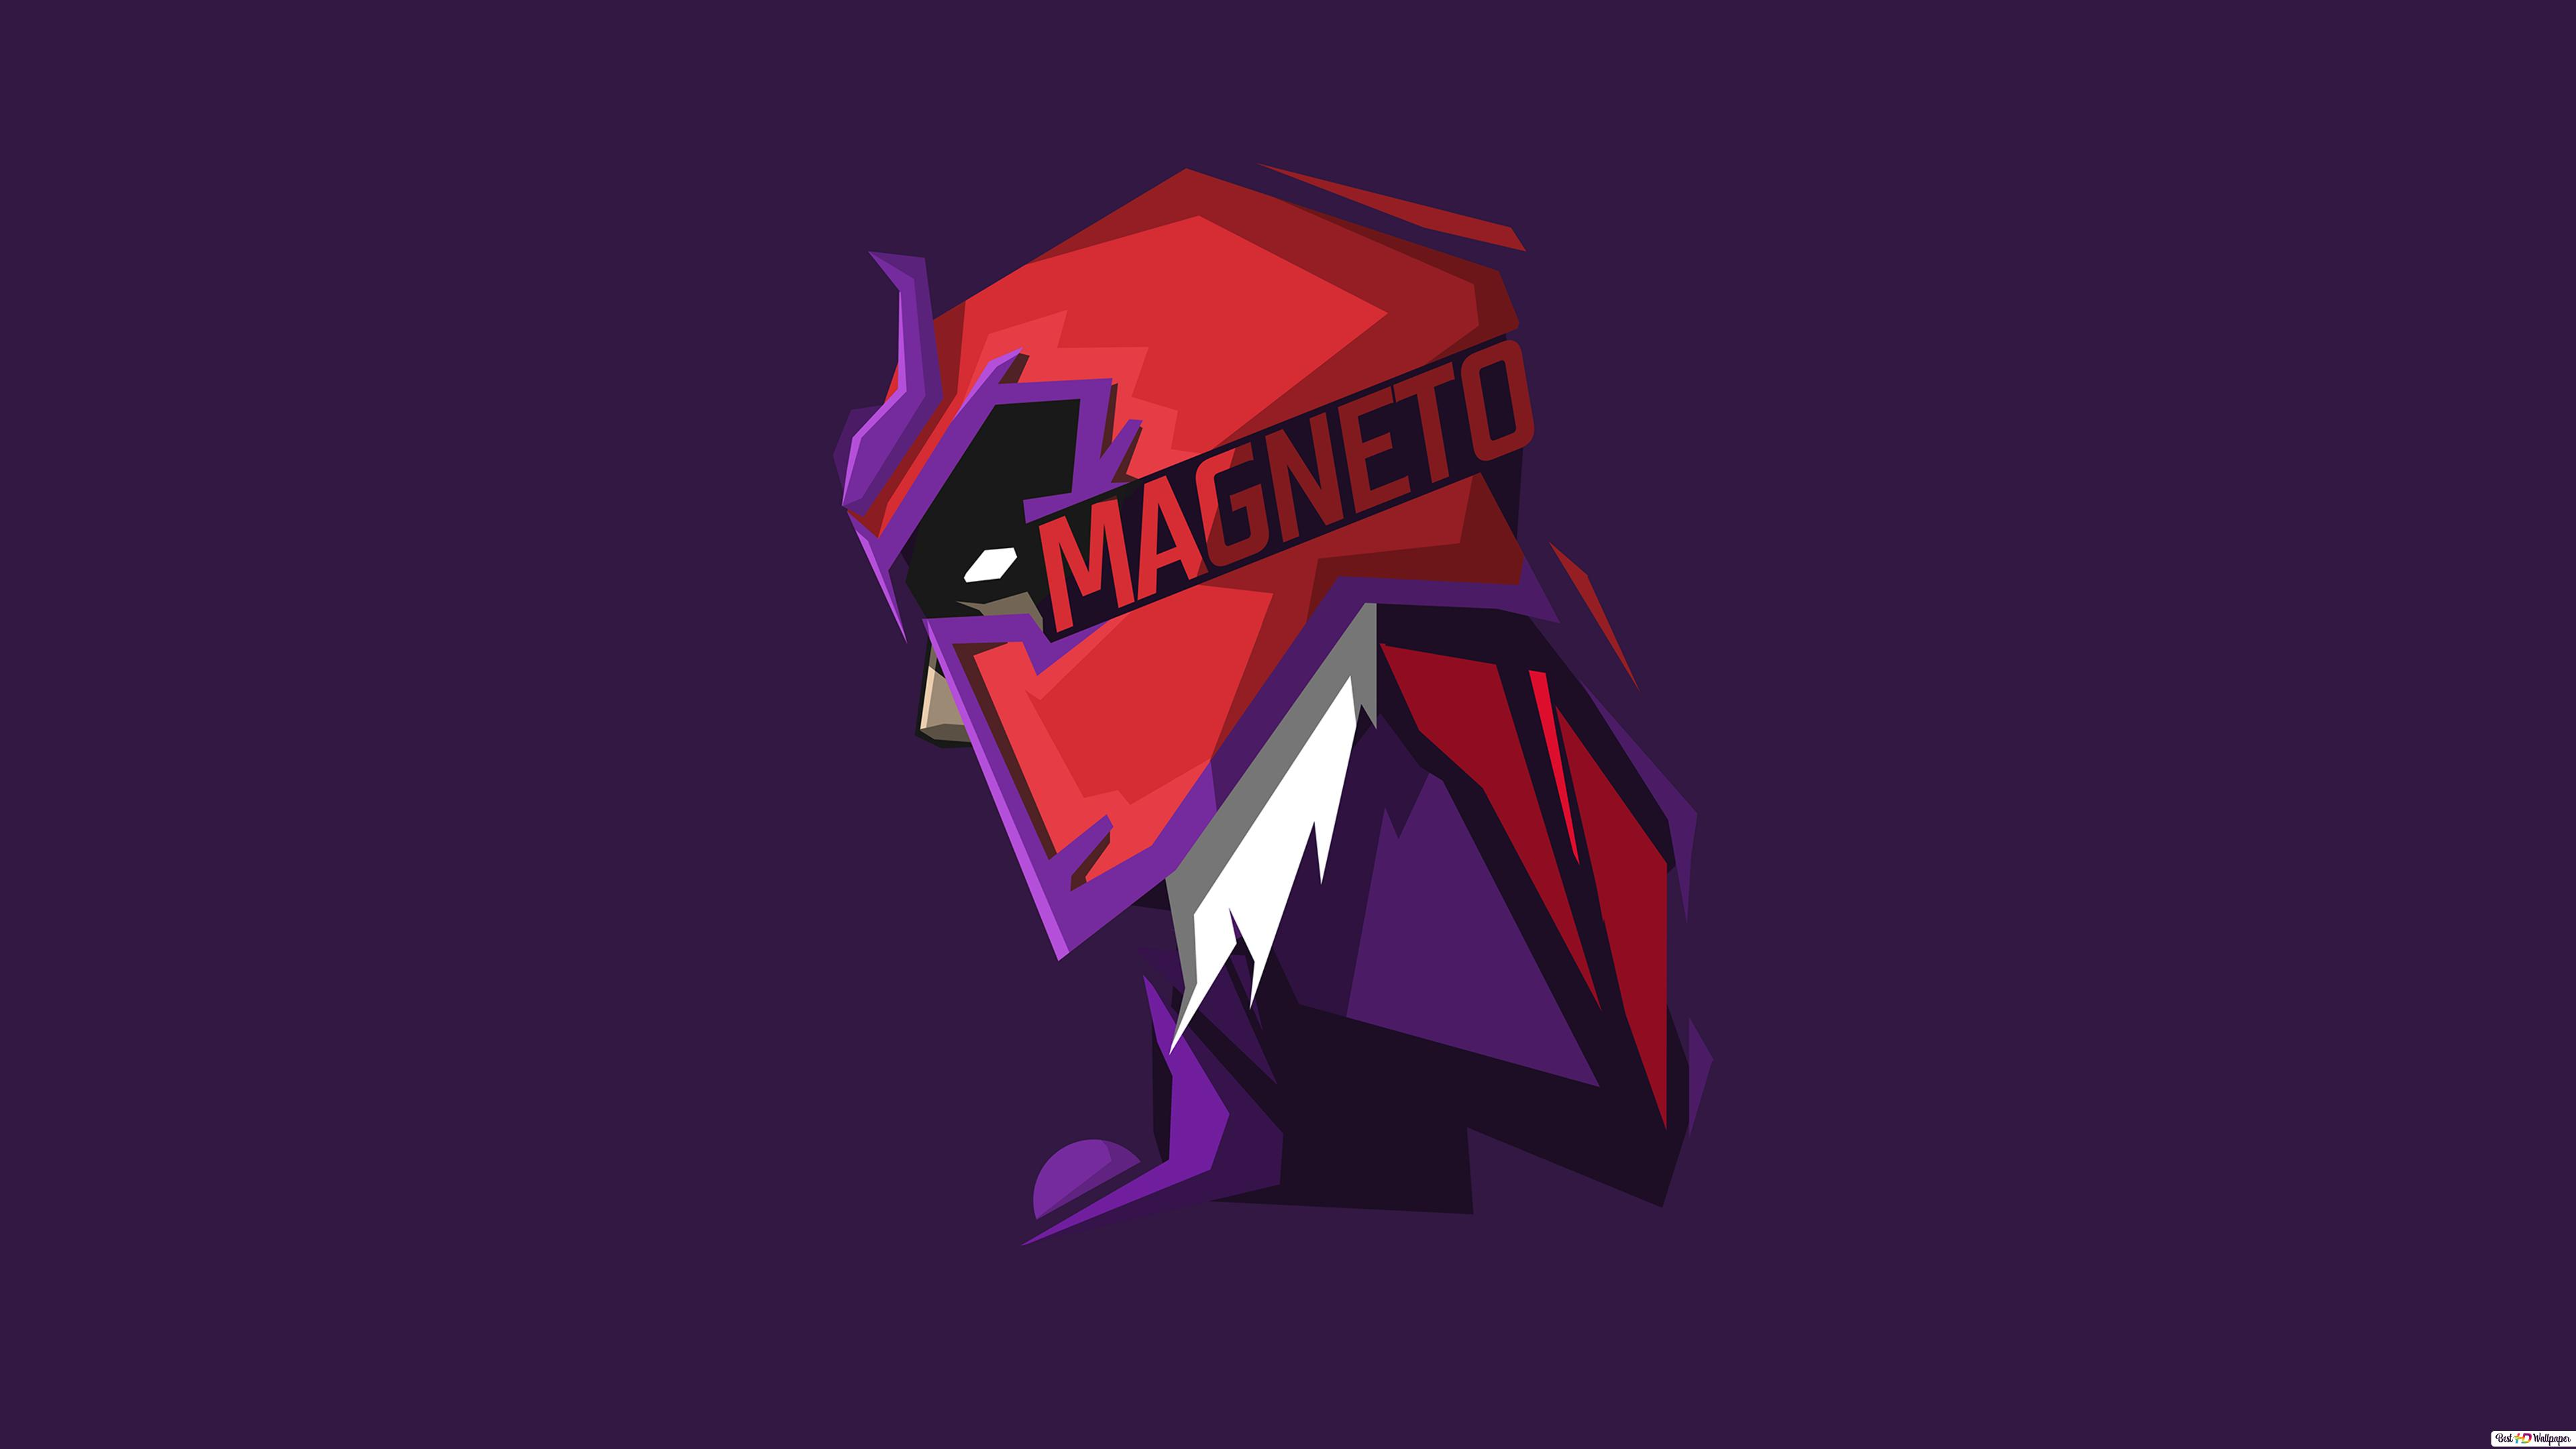 X Men Villain Magneto Minimalist In Purple Wallpaper Hd Wallpaper Download